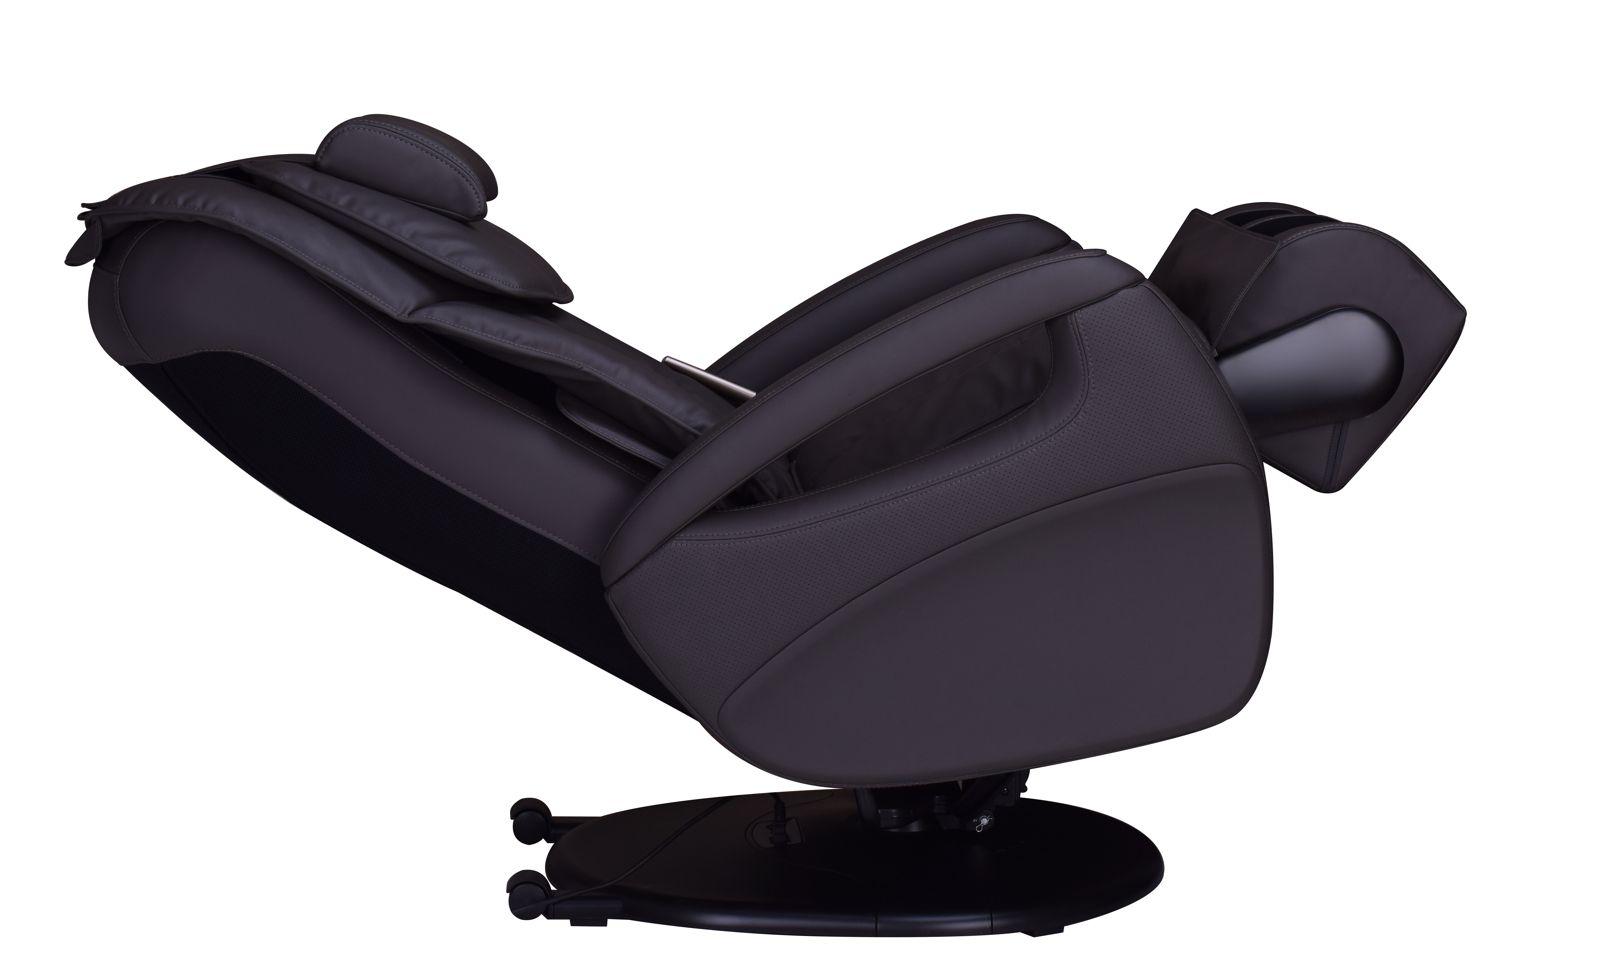 Fauteuil de massage Alpha techno Tranquillity AT699i 10